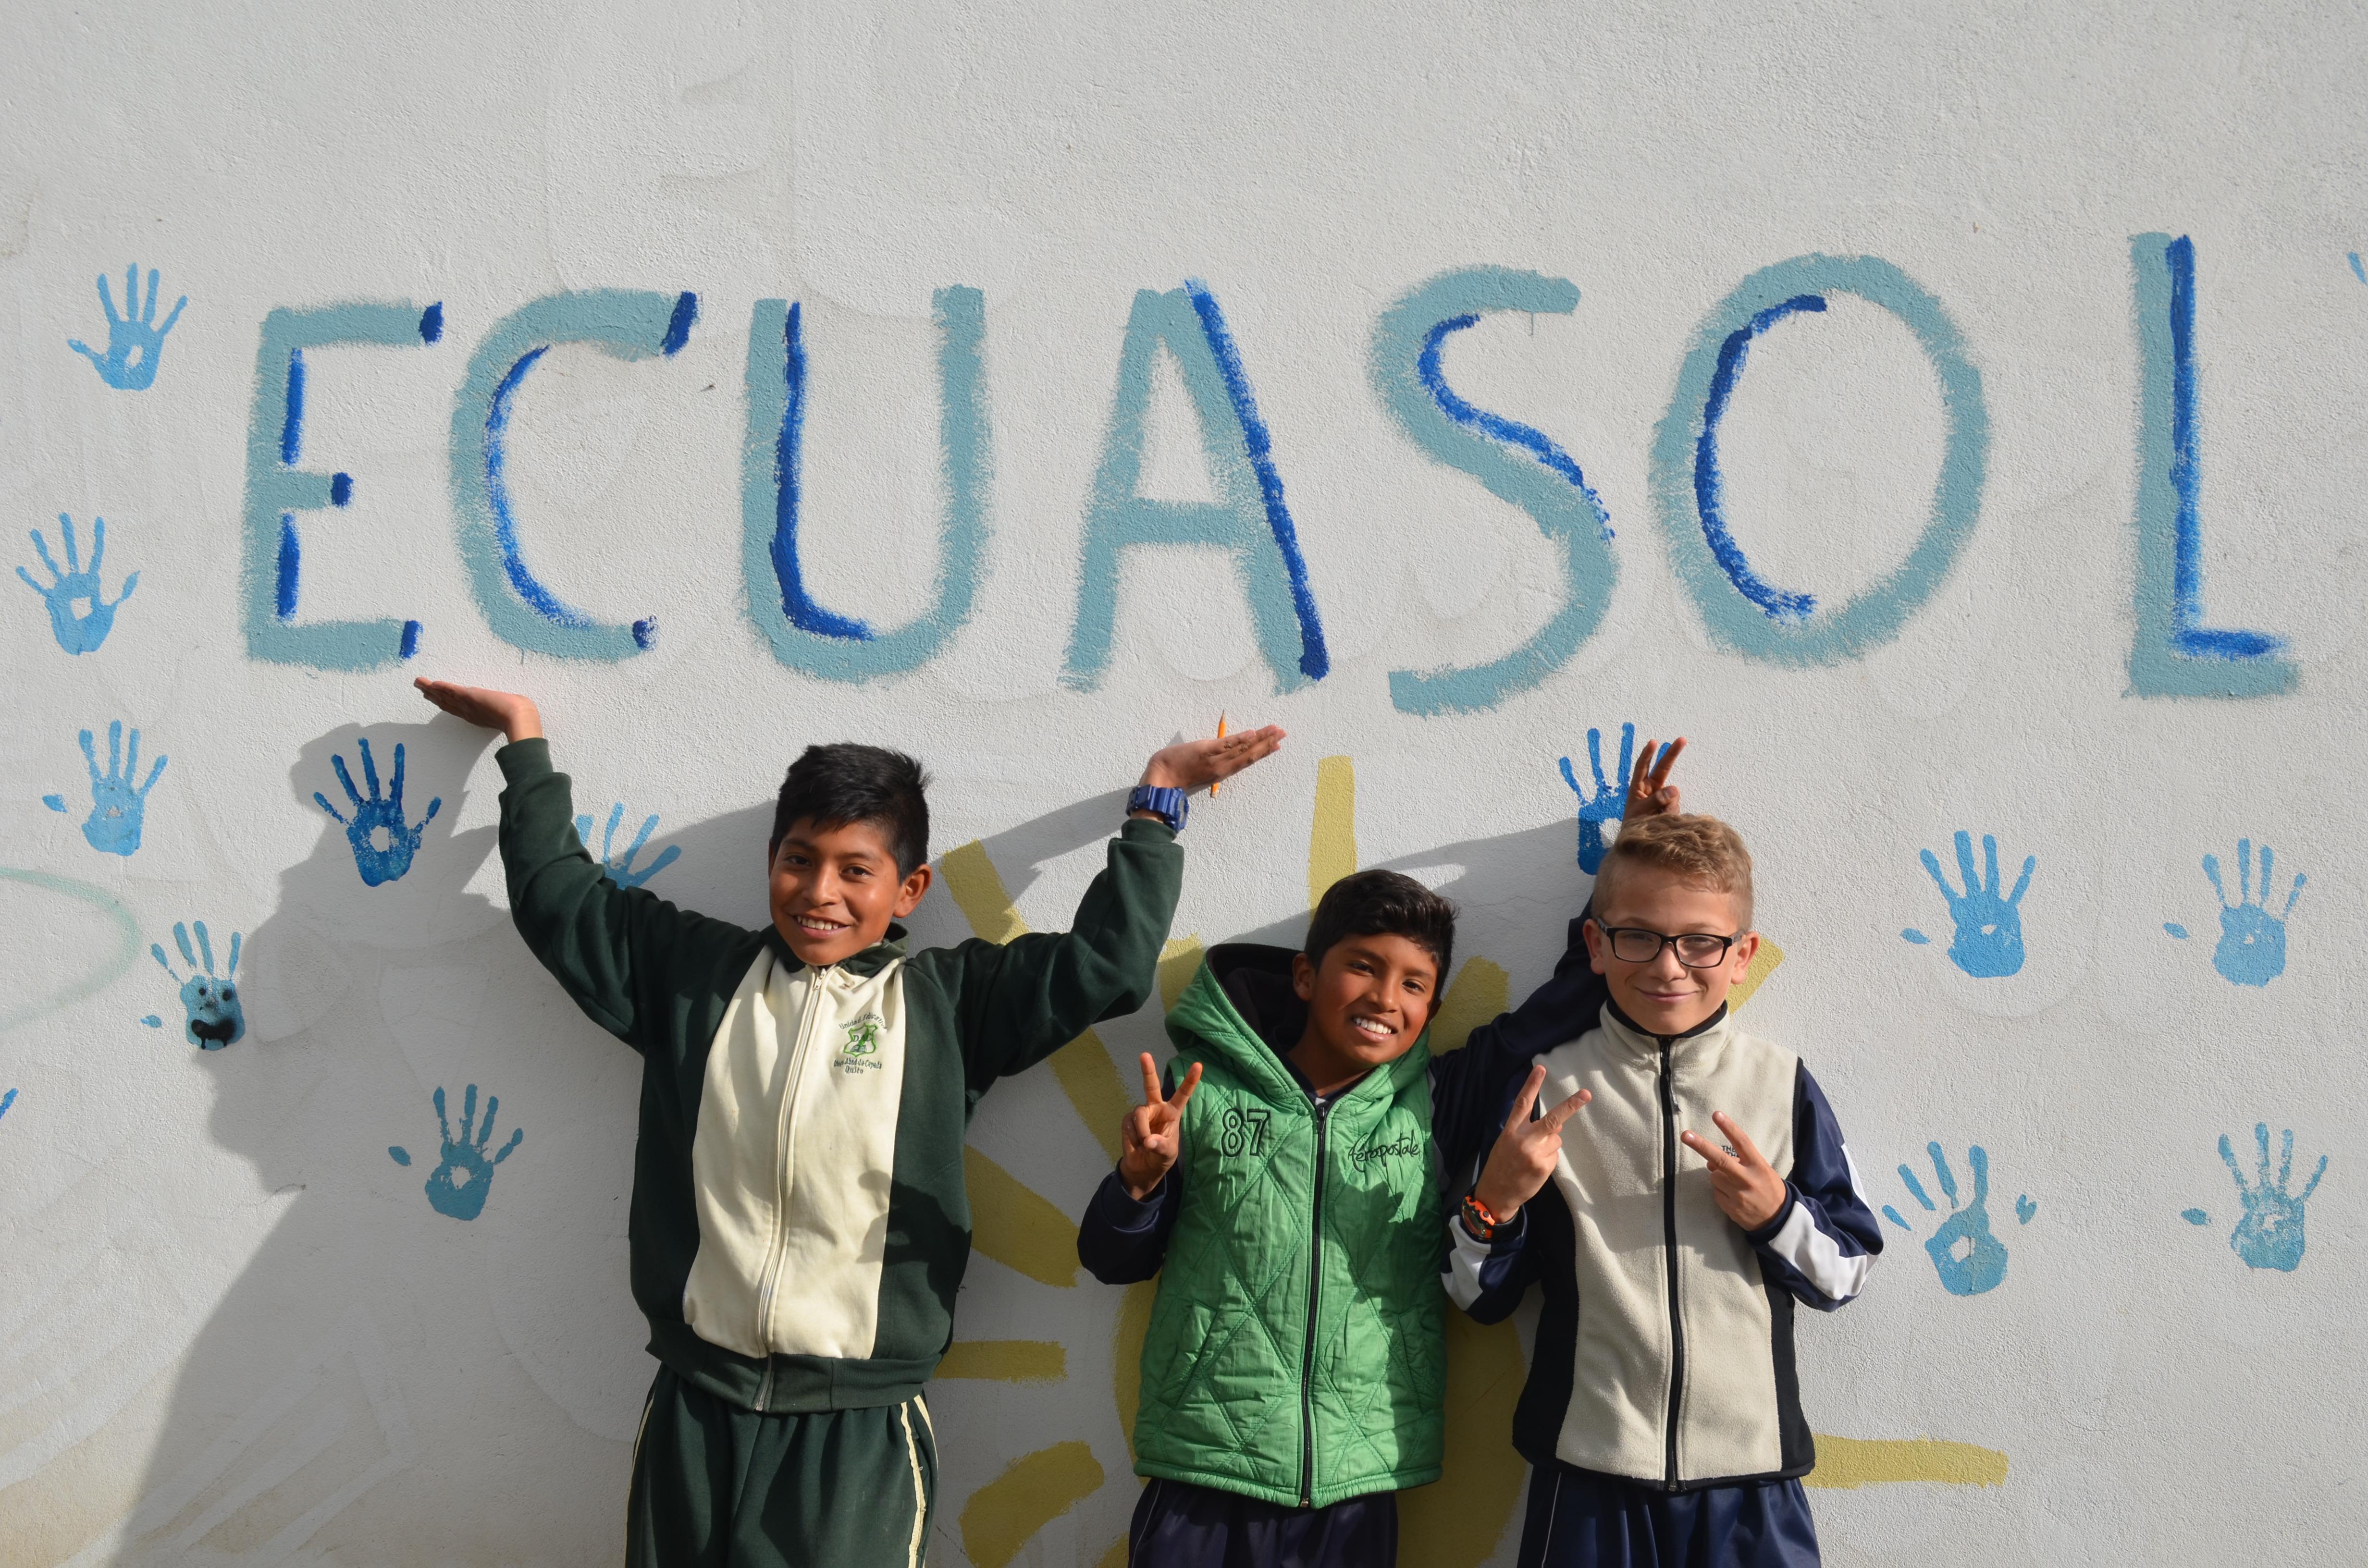 Enfants Ecuasol